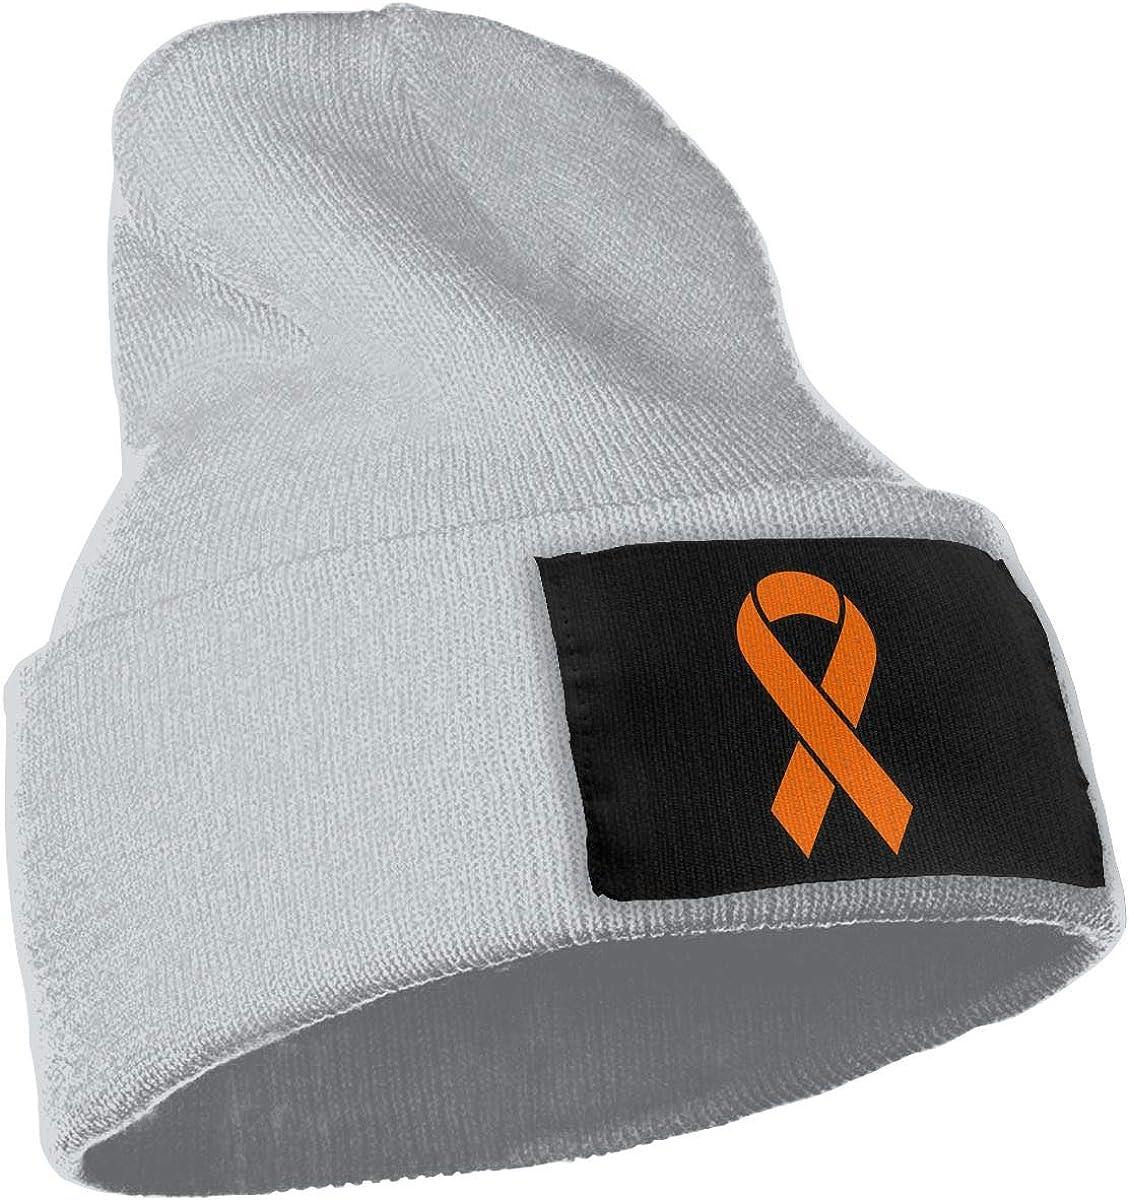 COLLJL-8 Men//Women Leukemia Ribbons Outdoor Stretch Knit Beanies Hat Soft Winter Skull Caps